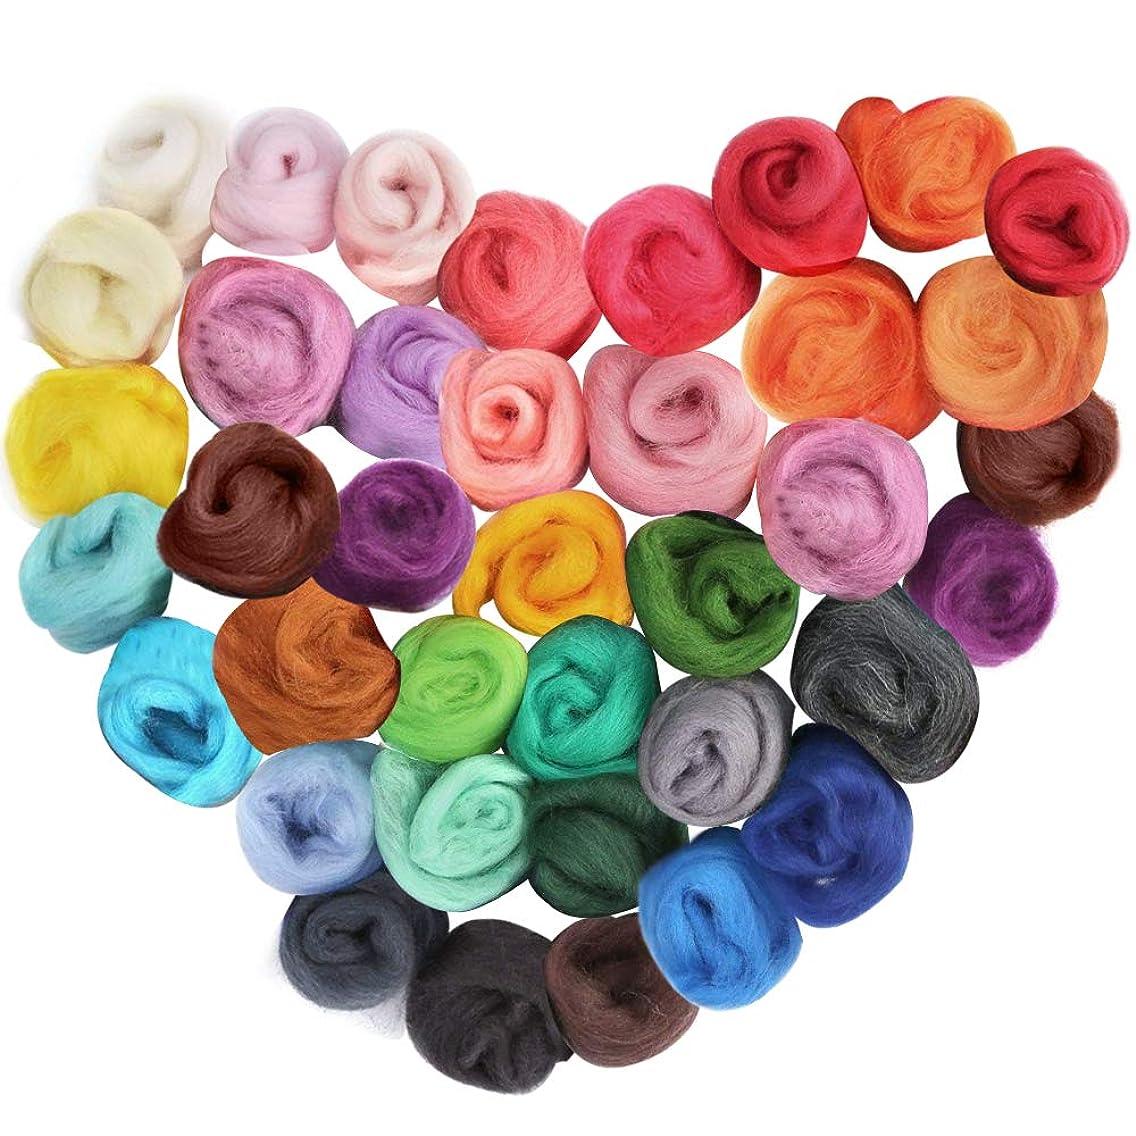 LoveInUSA Needle Felting Wool Fibre Wool Yarn Roving for DIY Craft Materials 36 Colors